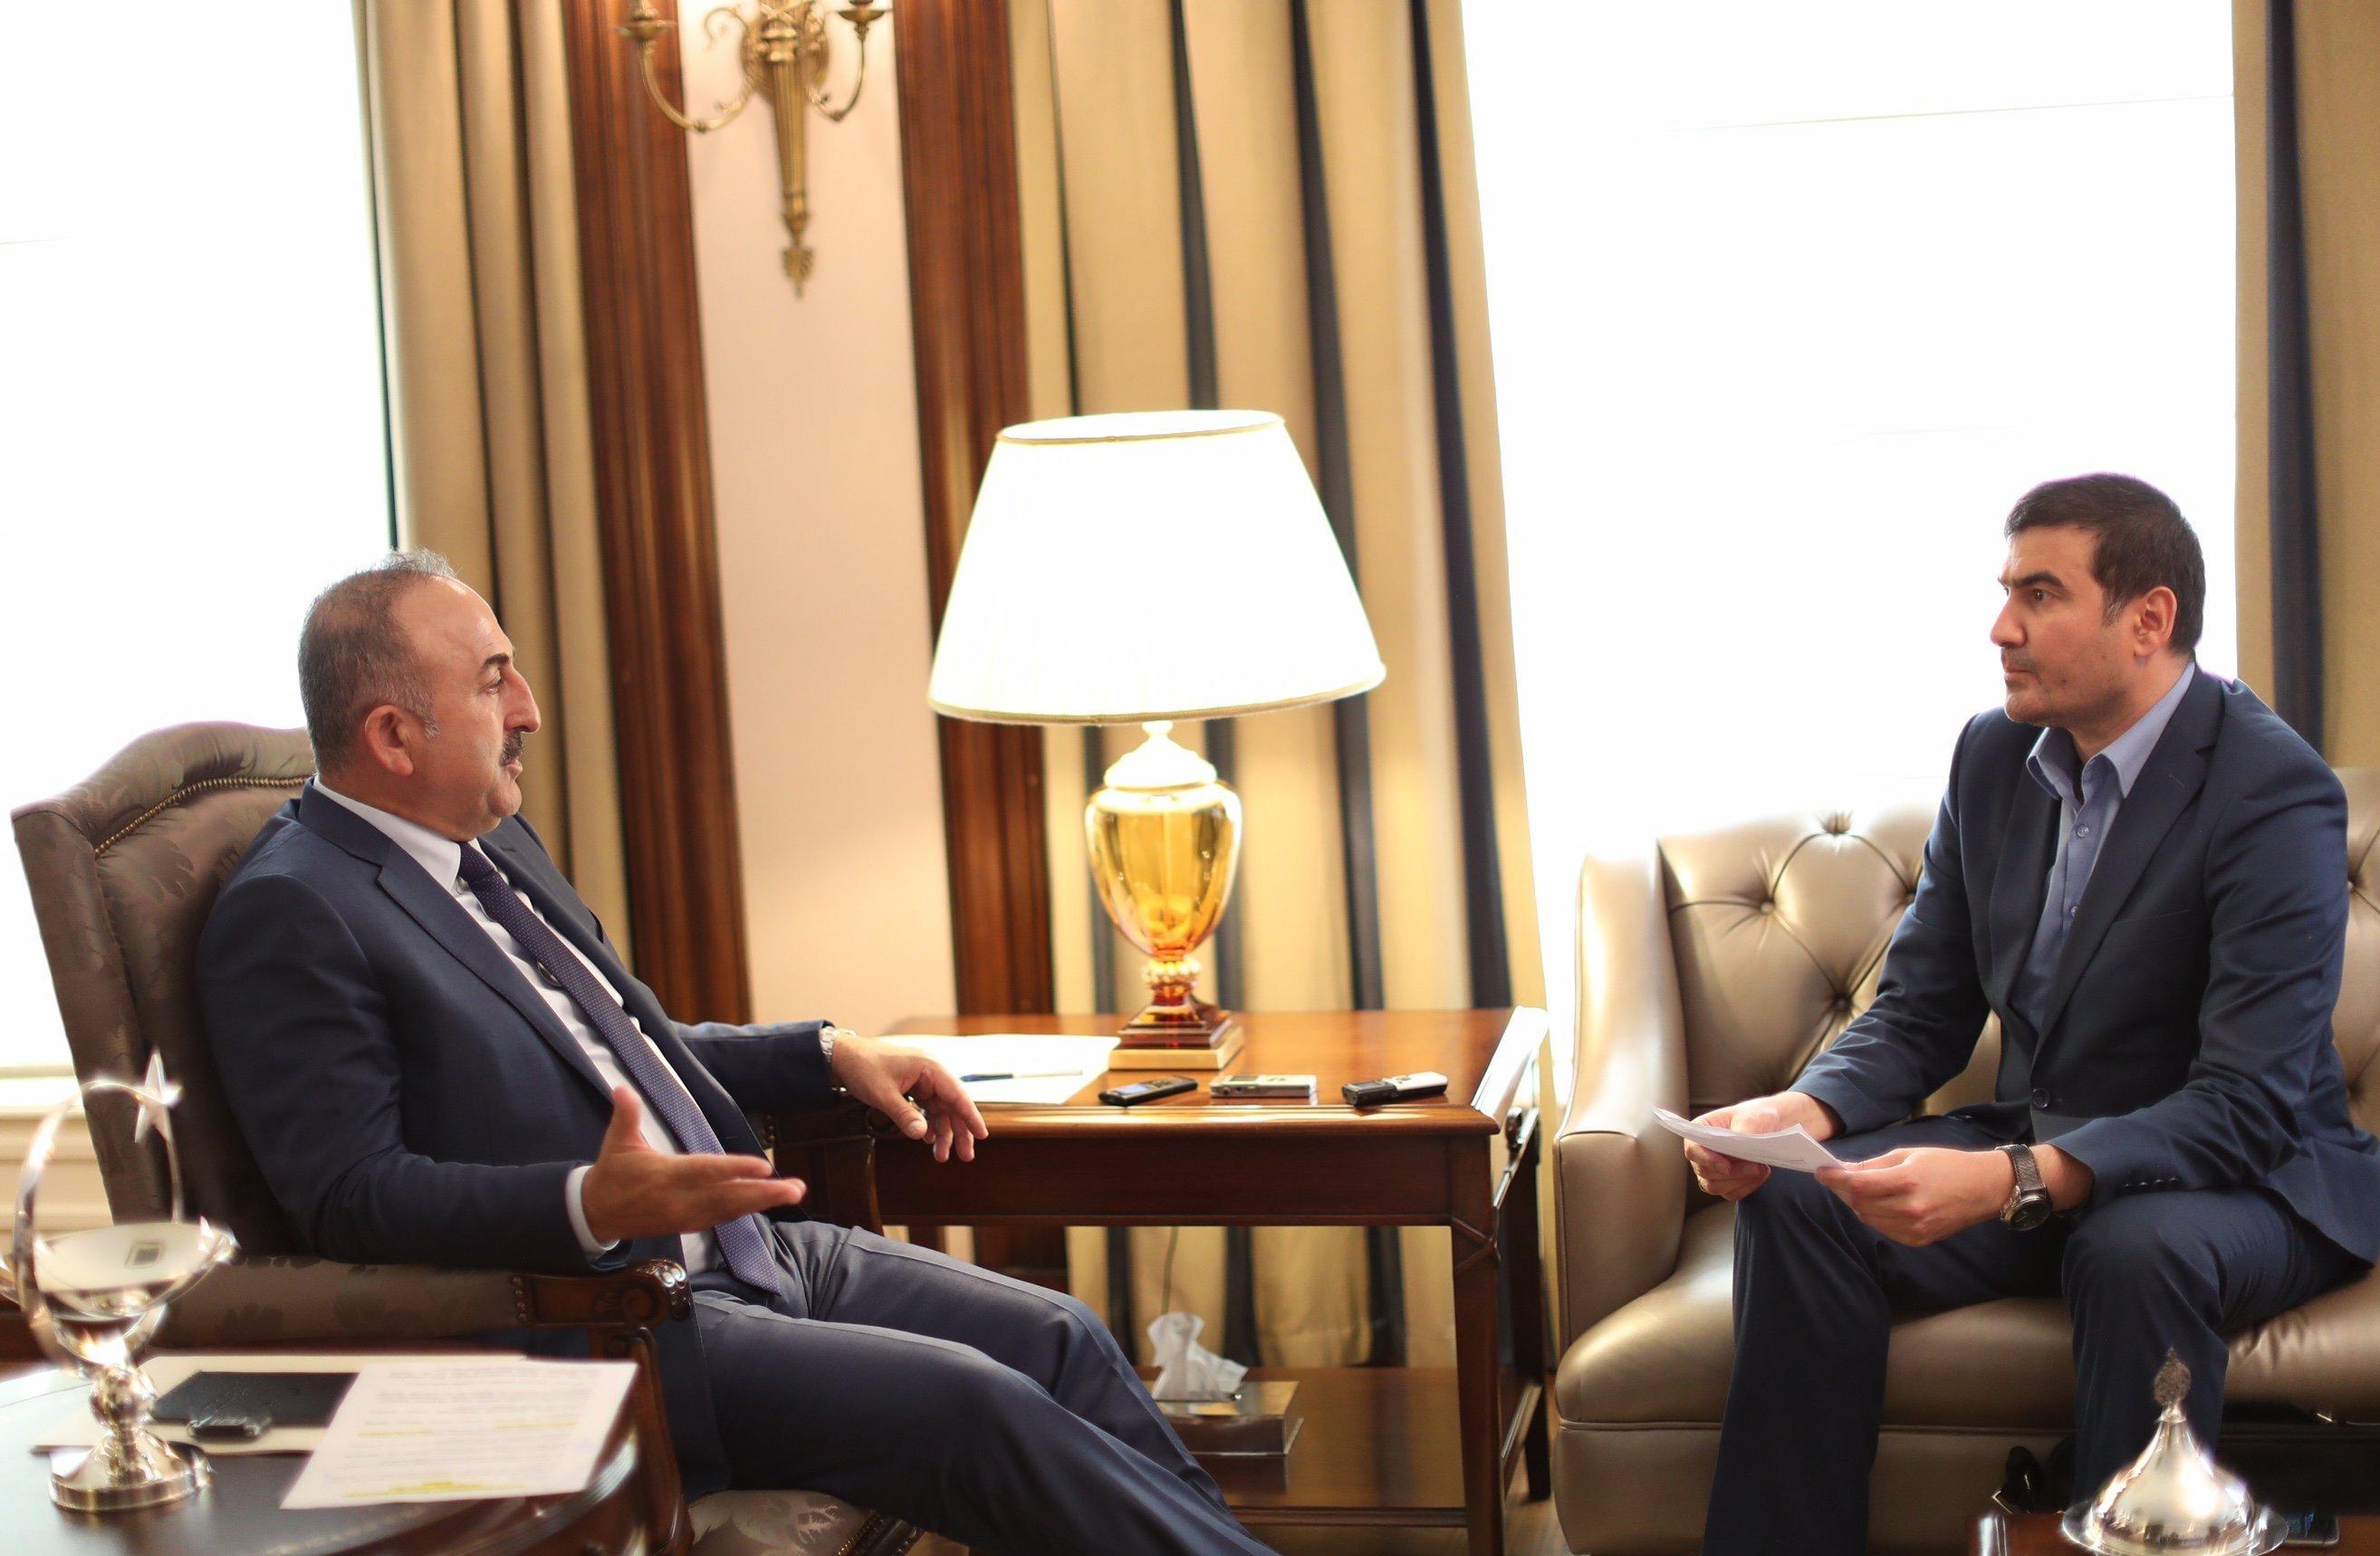 Mevlut Cavusoglu gave an exclusive interview to Sputnik